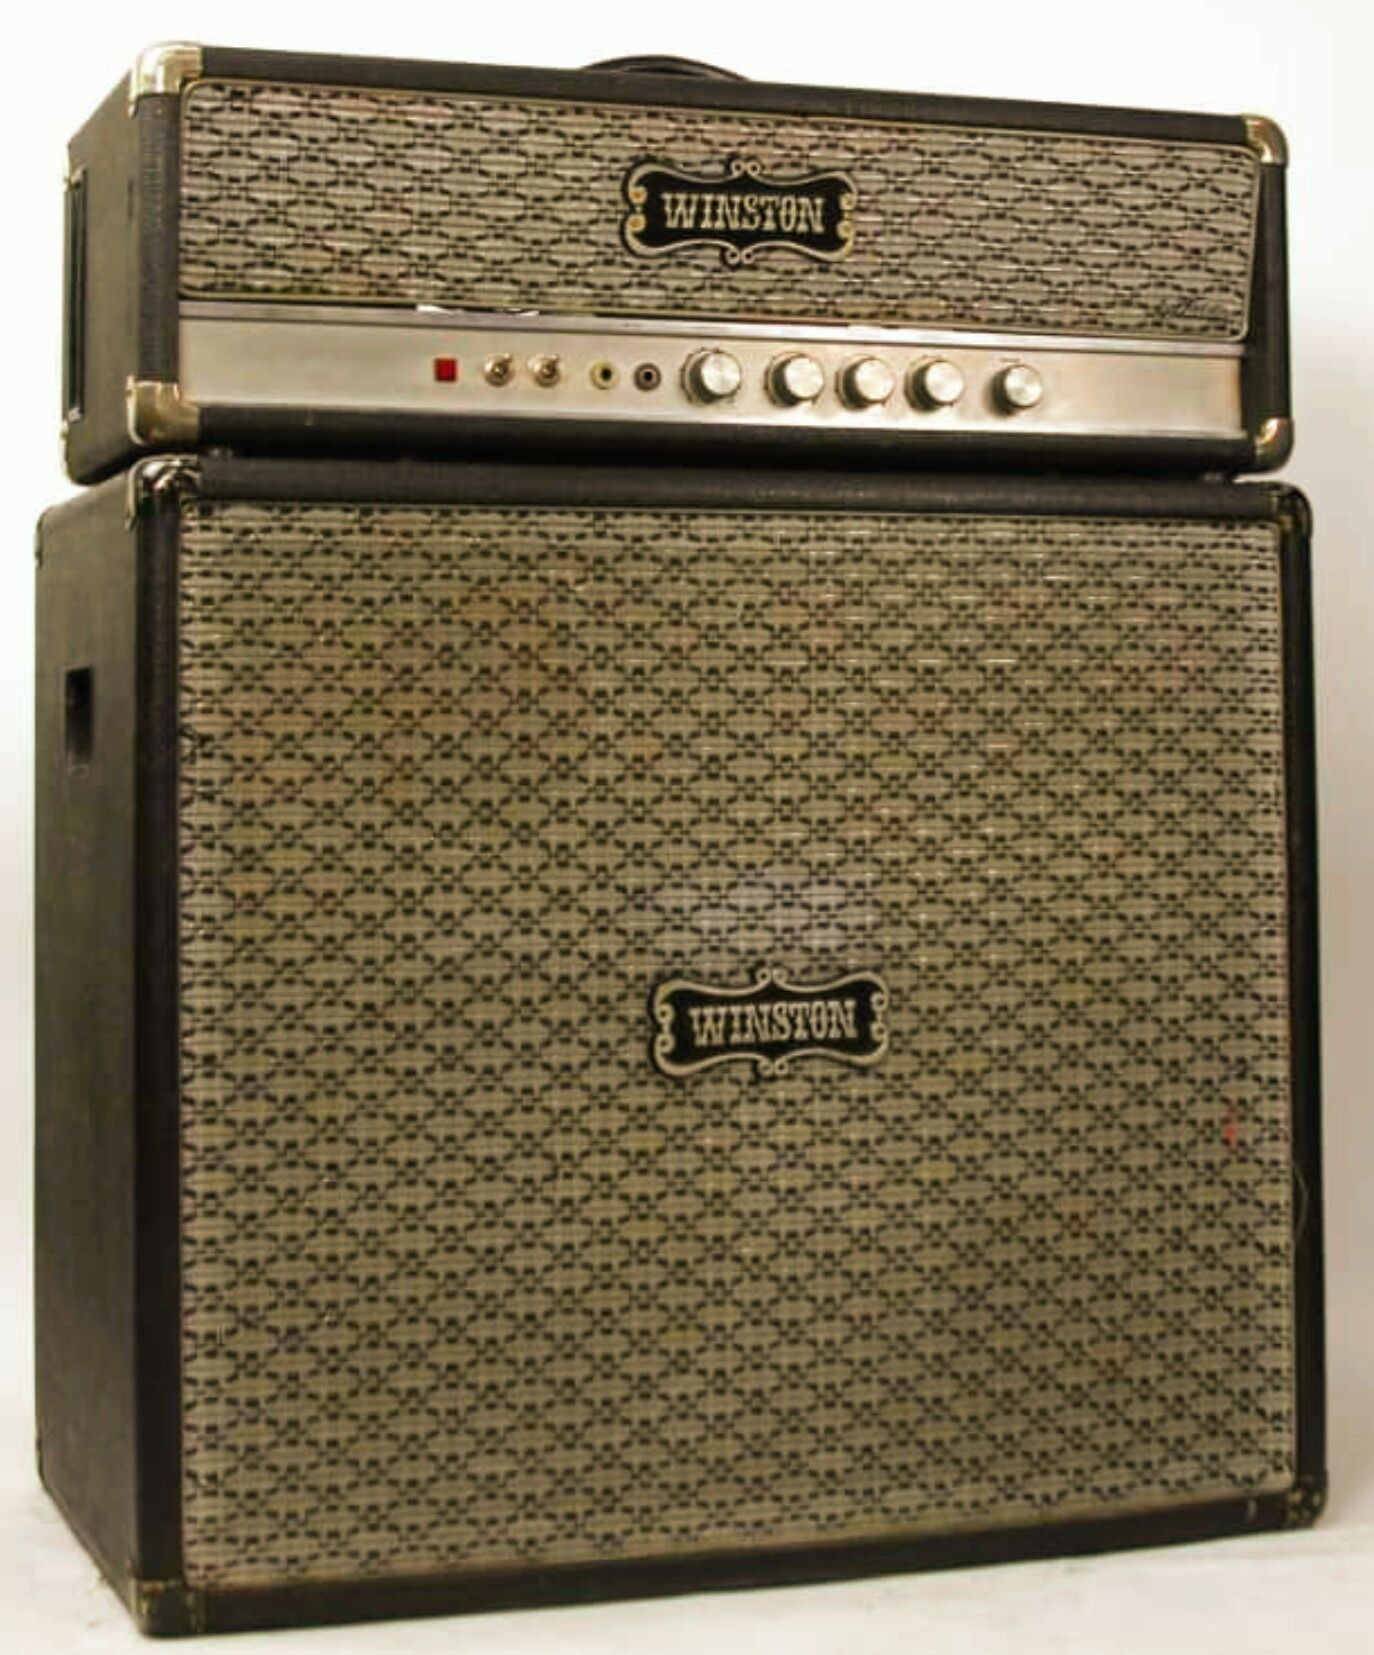 hight resolution of 1970 winston ba 200 made by echolette de germanium ss pre amp w four el34 two 85 watt 12inch fane speakers great early hiwatt sound save schematic